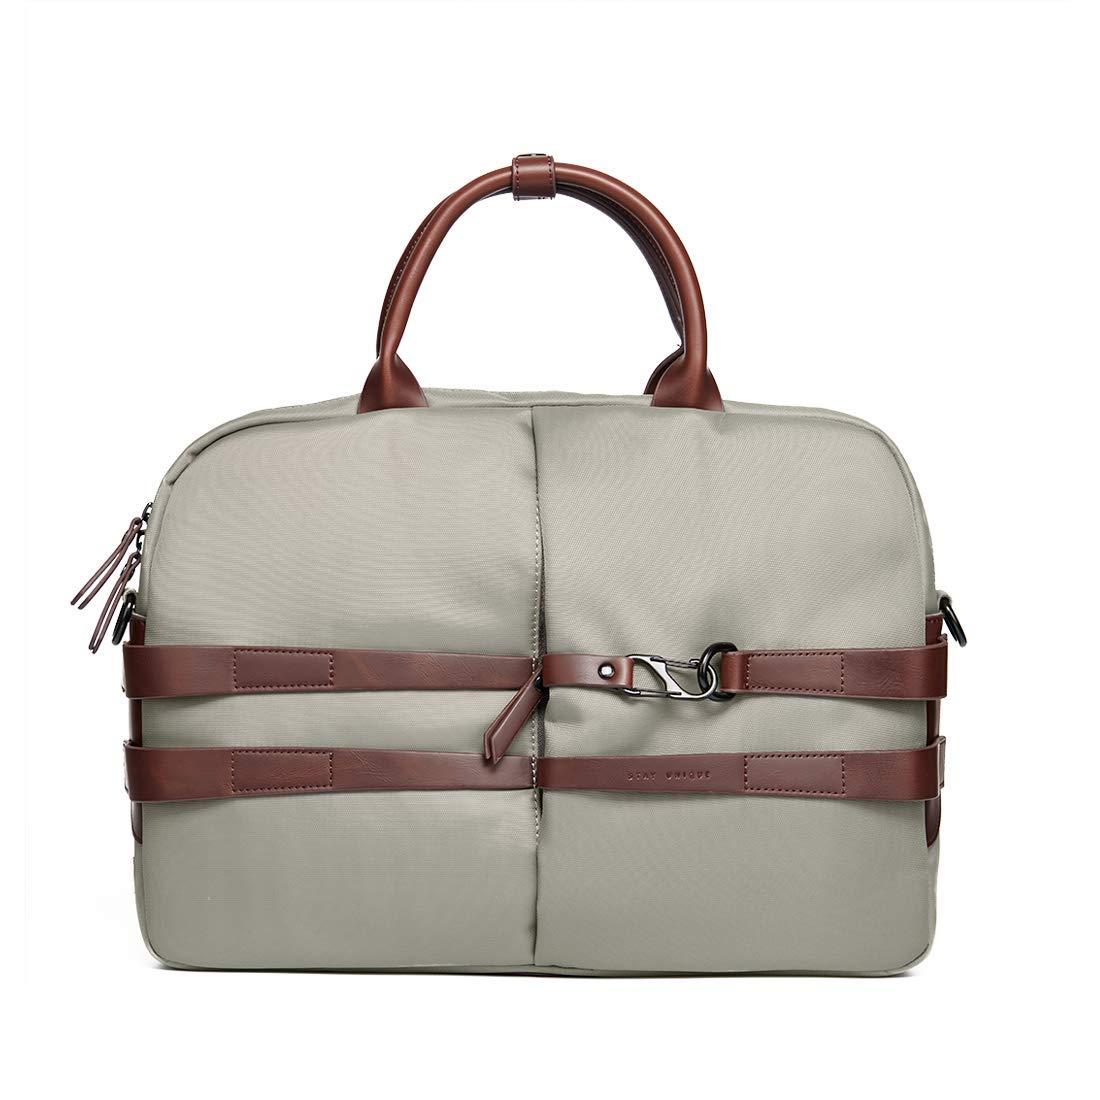 Laptop Bags for ladies